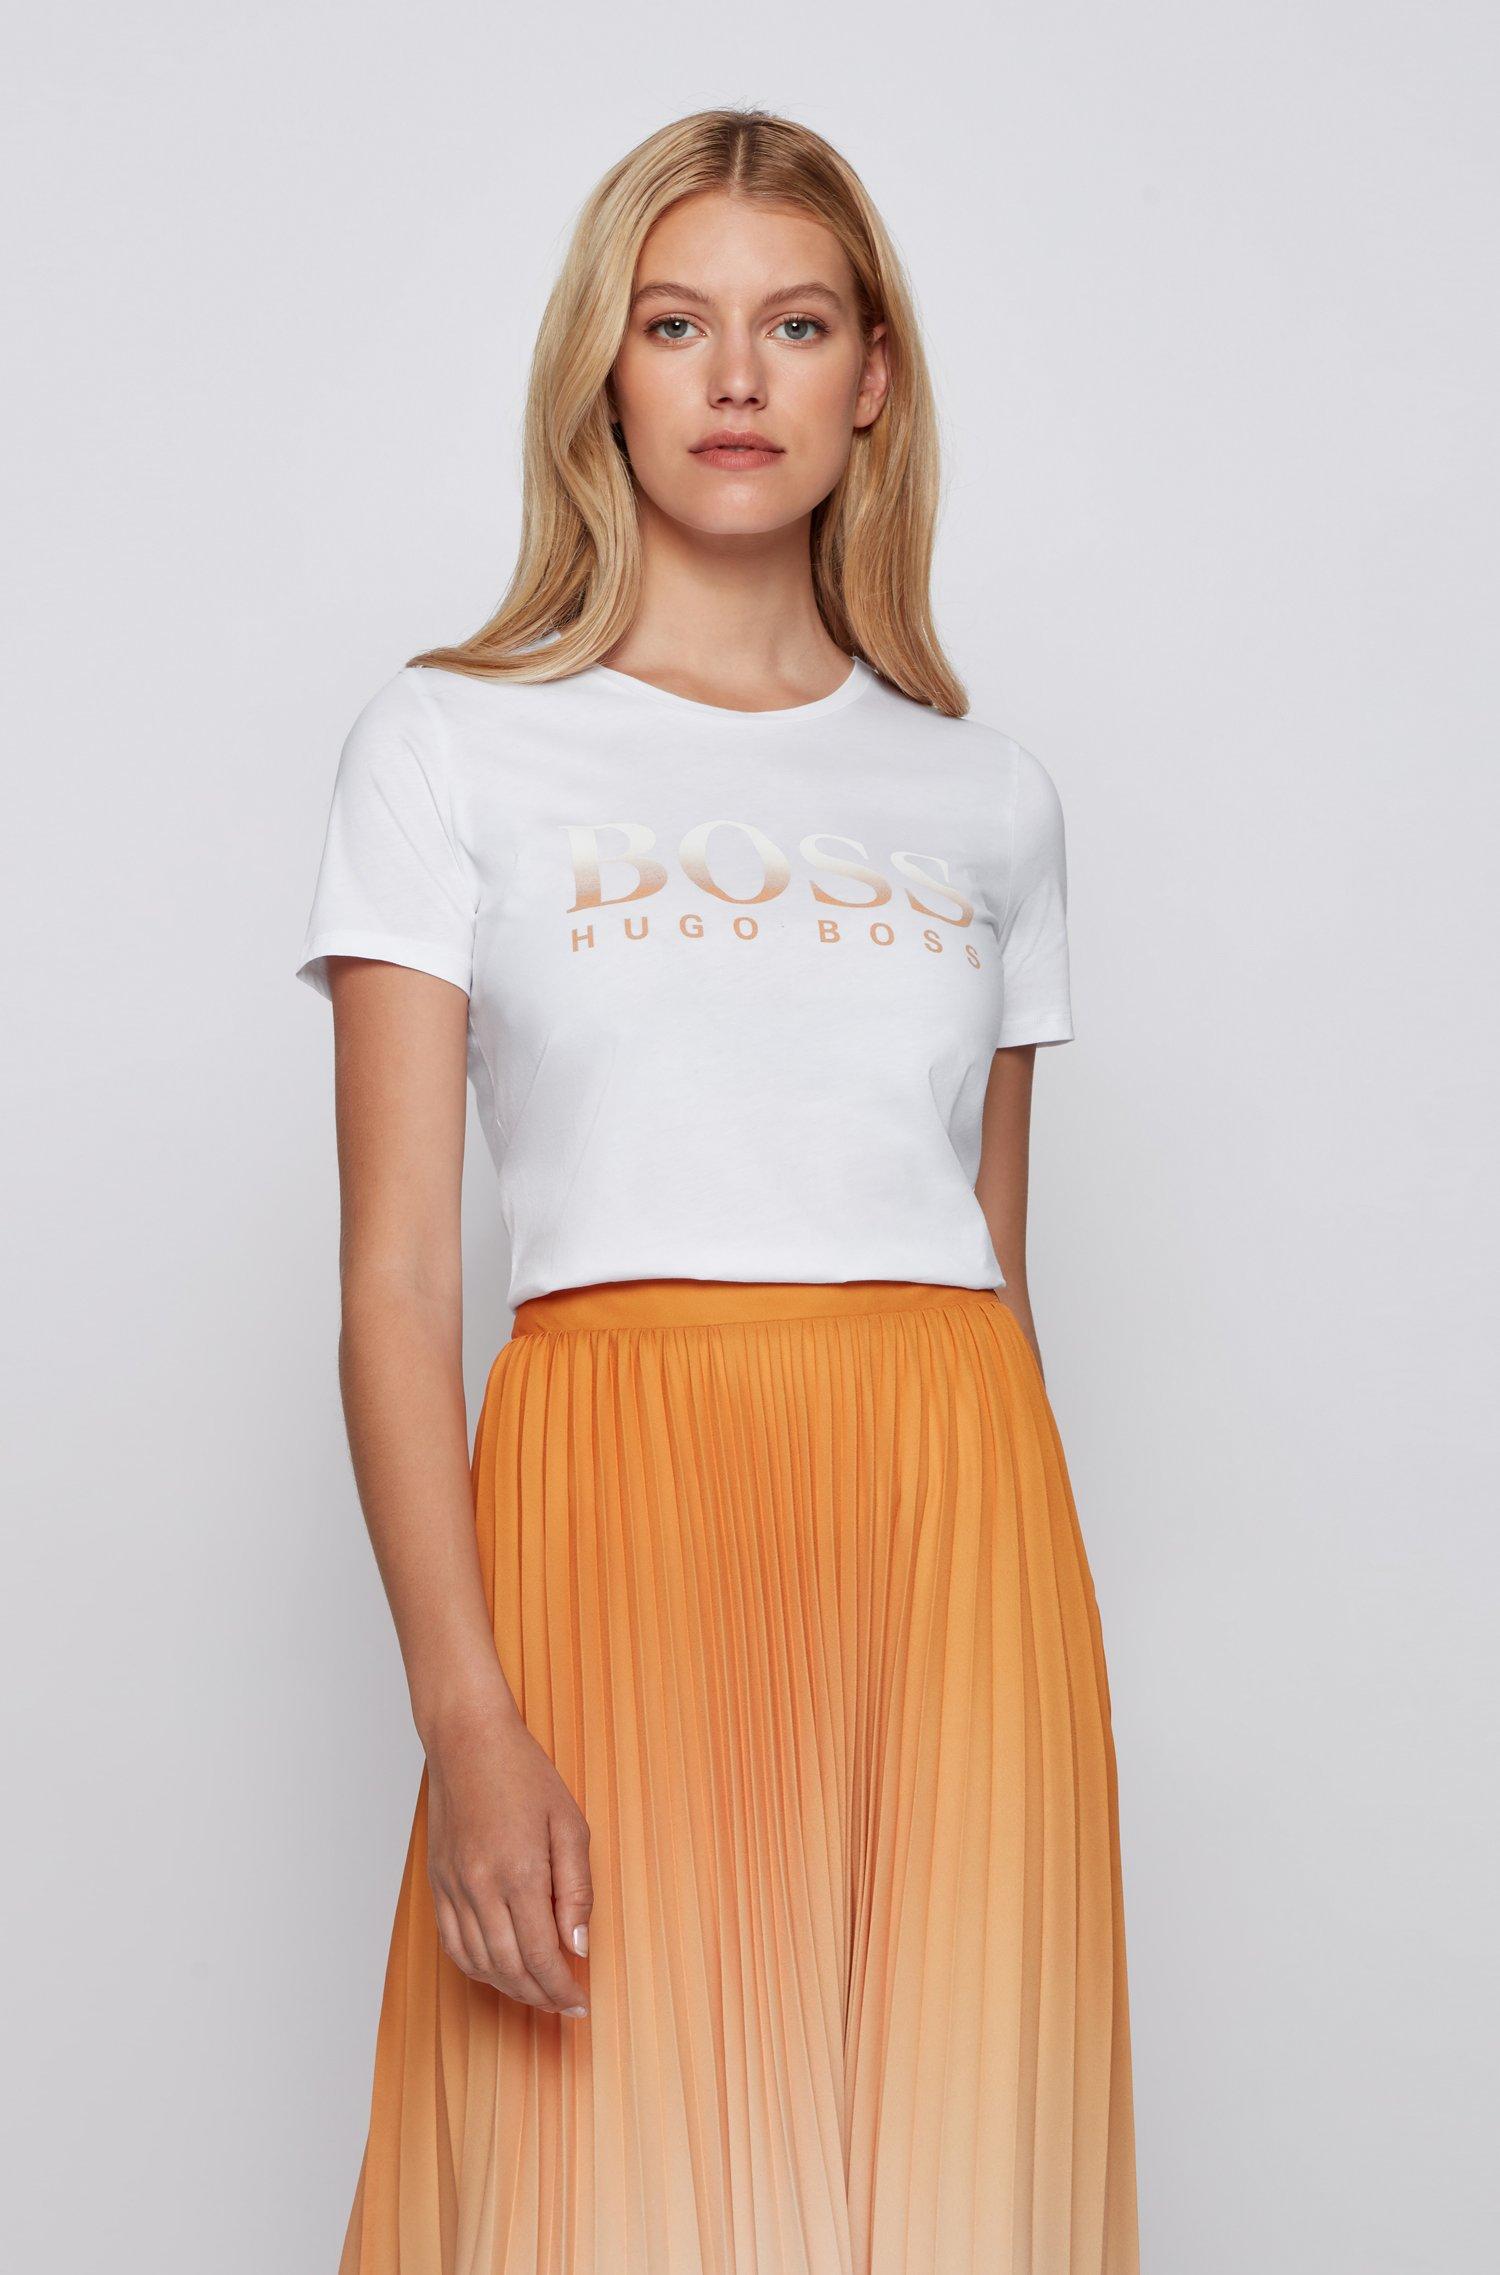 Crew-neck T-shirt in organic cotton with logo print, White